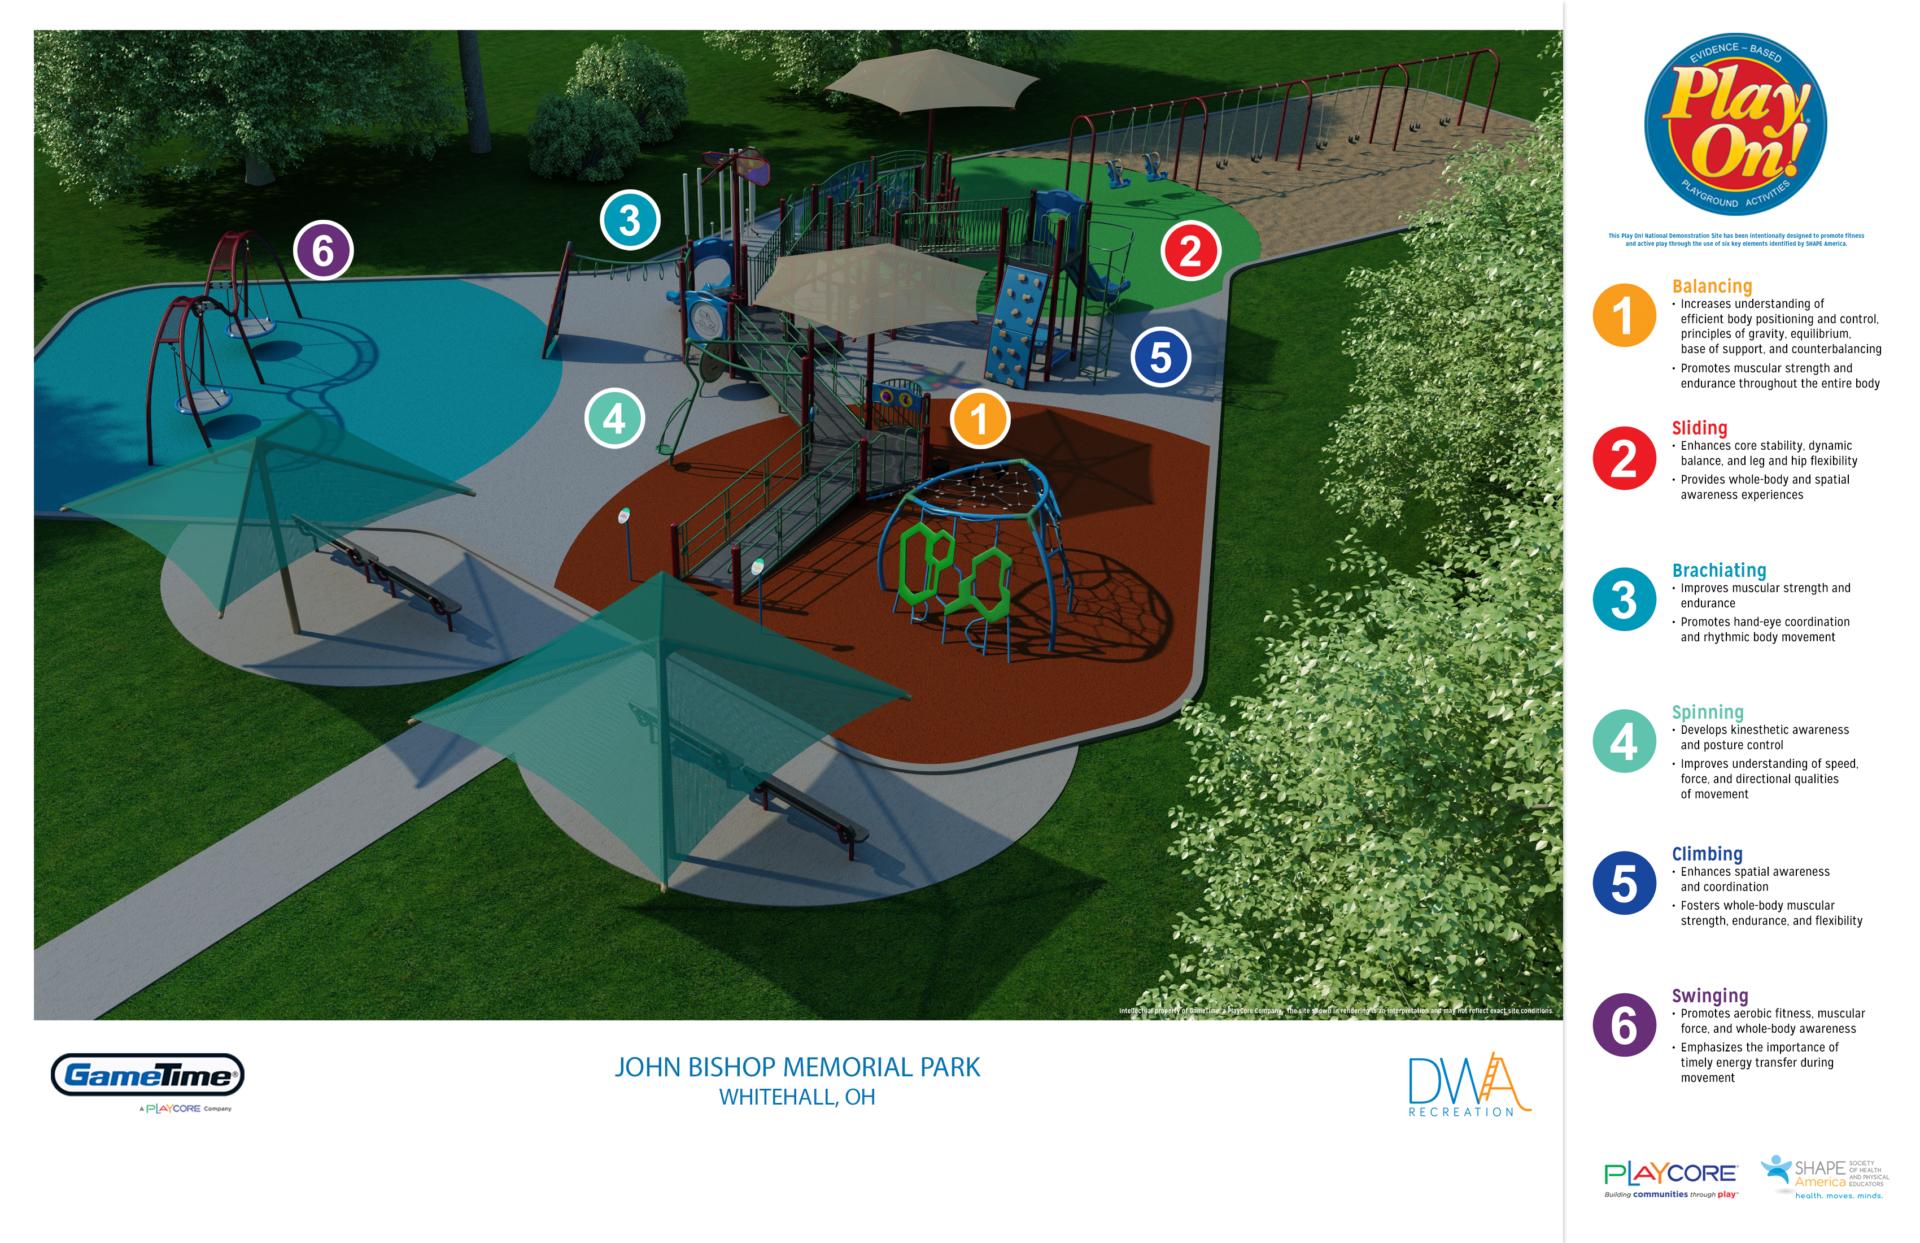 Play-On-View-3-3D-Rendering-John-Bishop-Memorial-Park-1.png#asset:6963